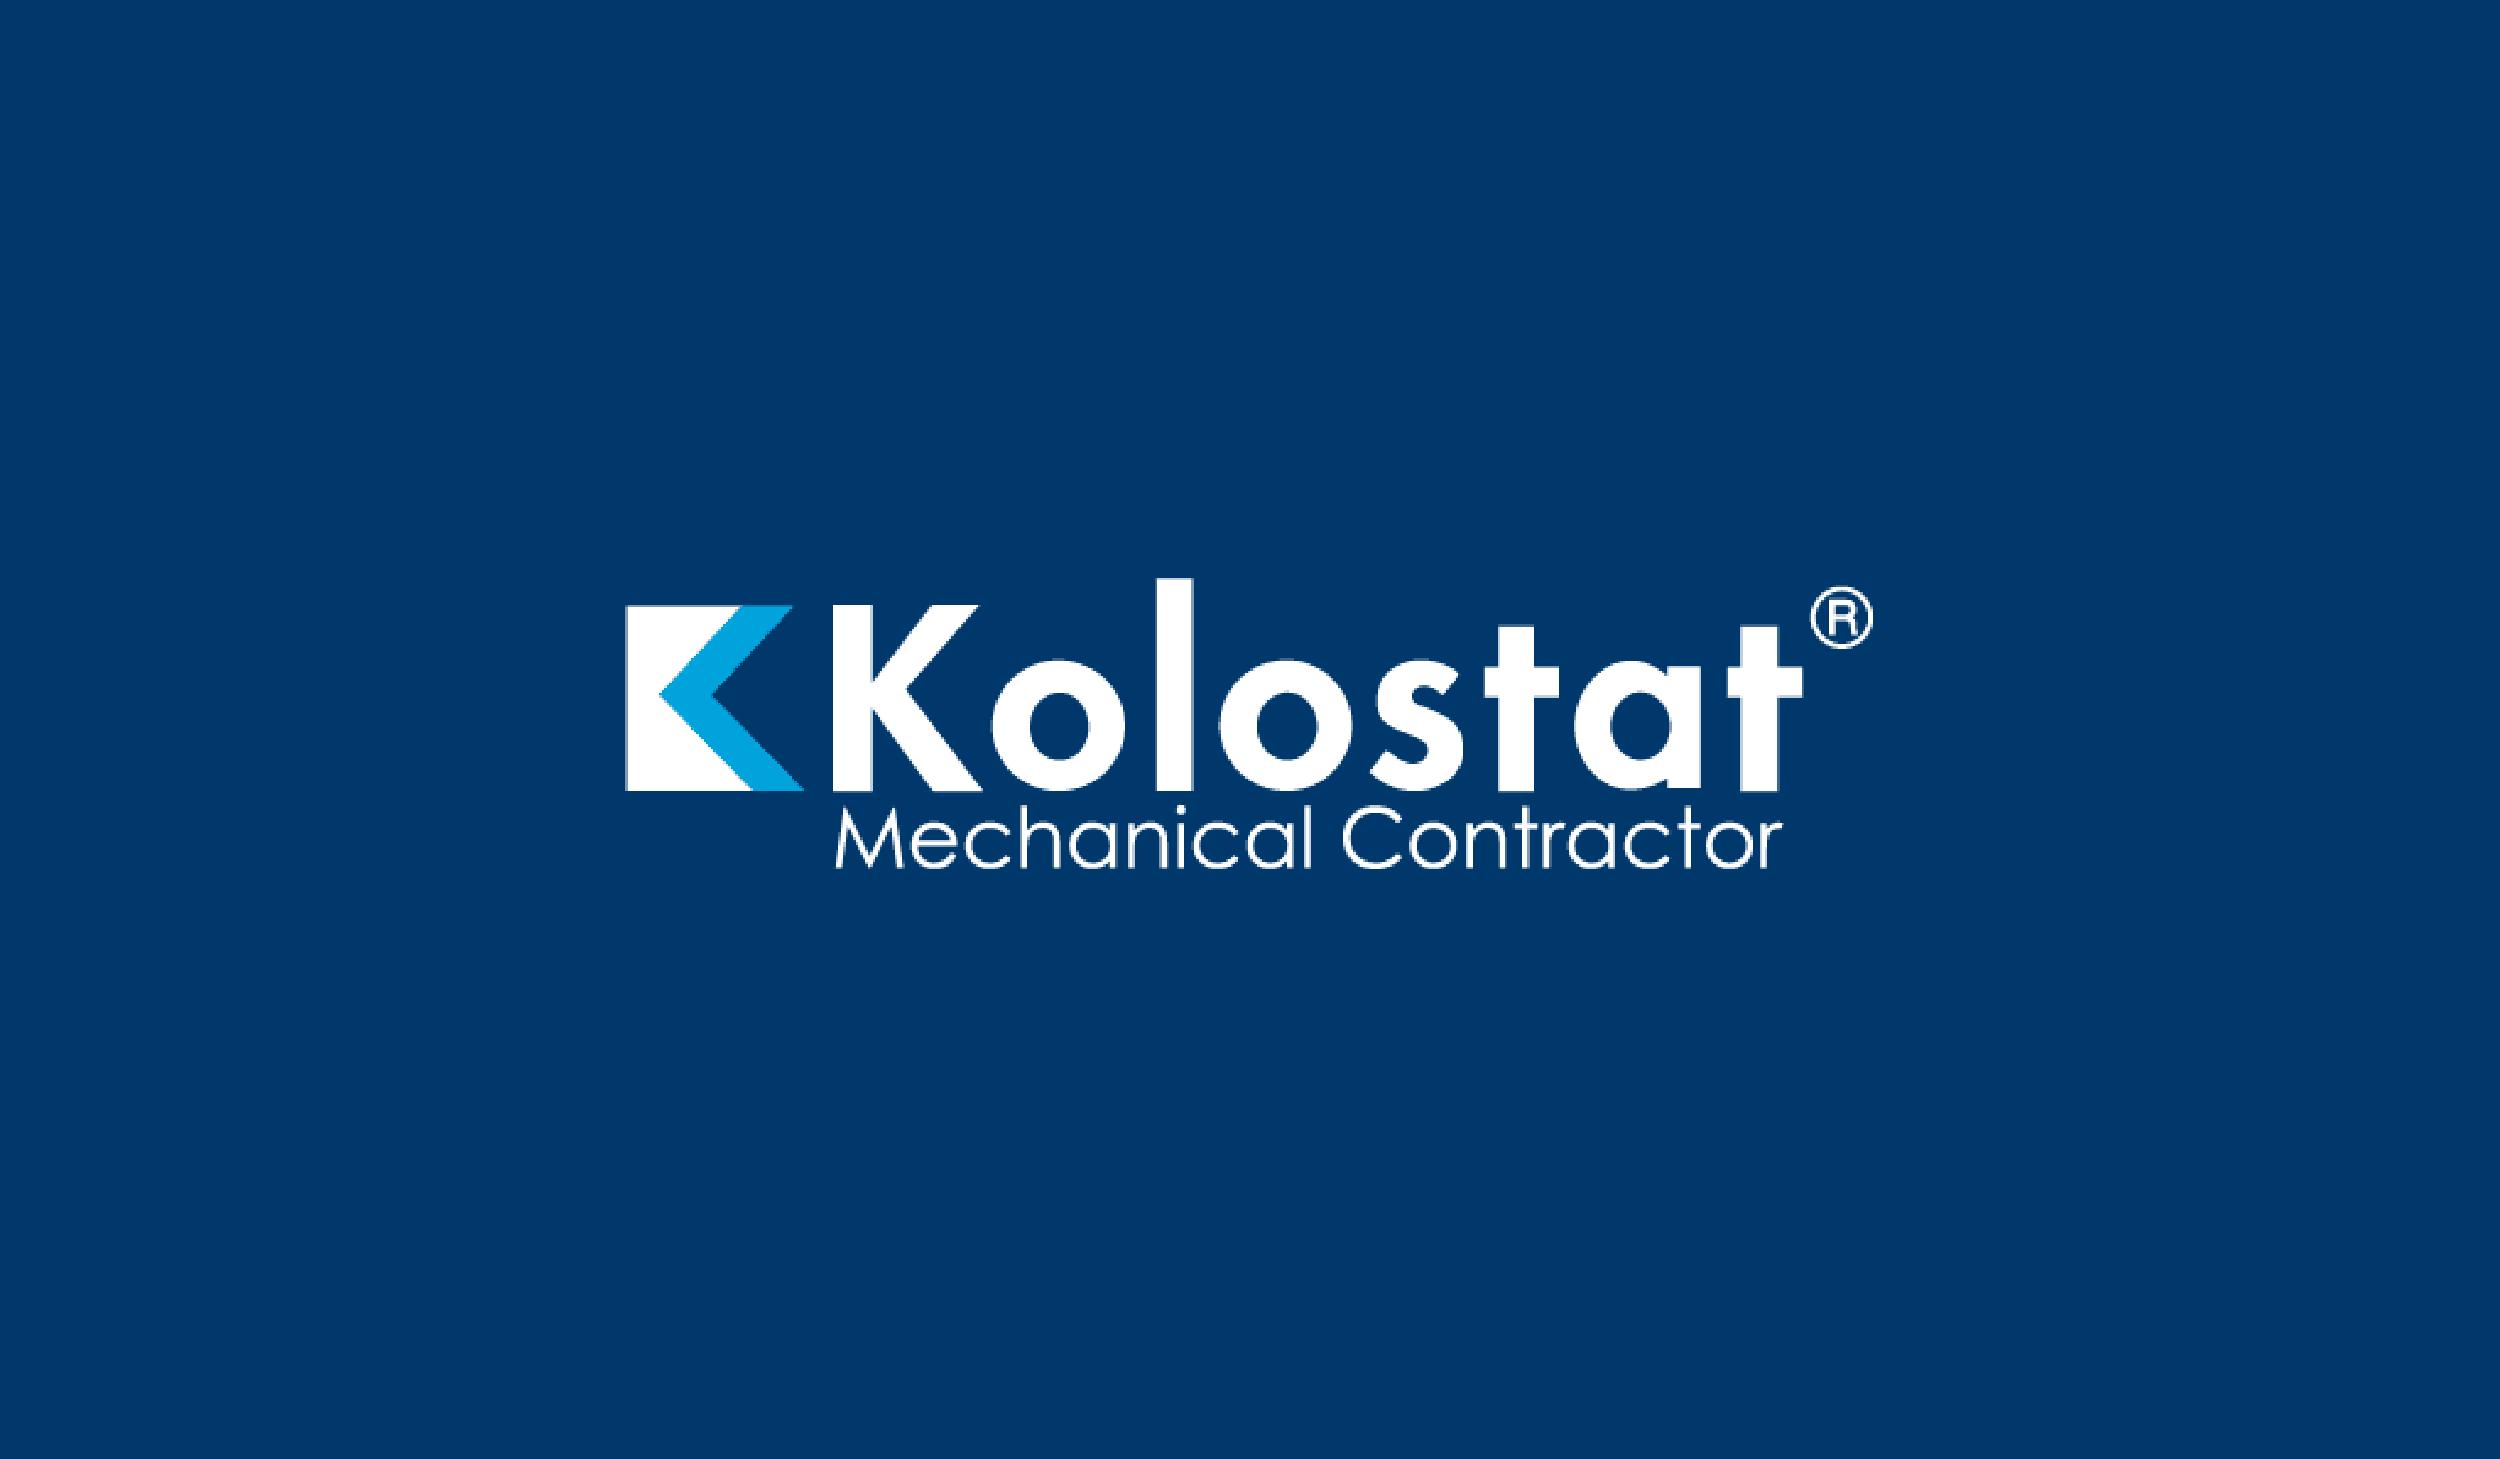 Logo de Kolostat